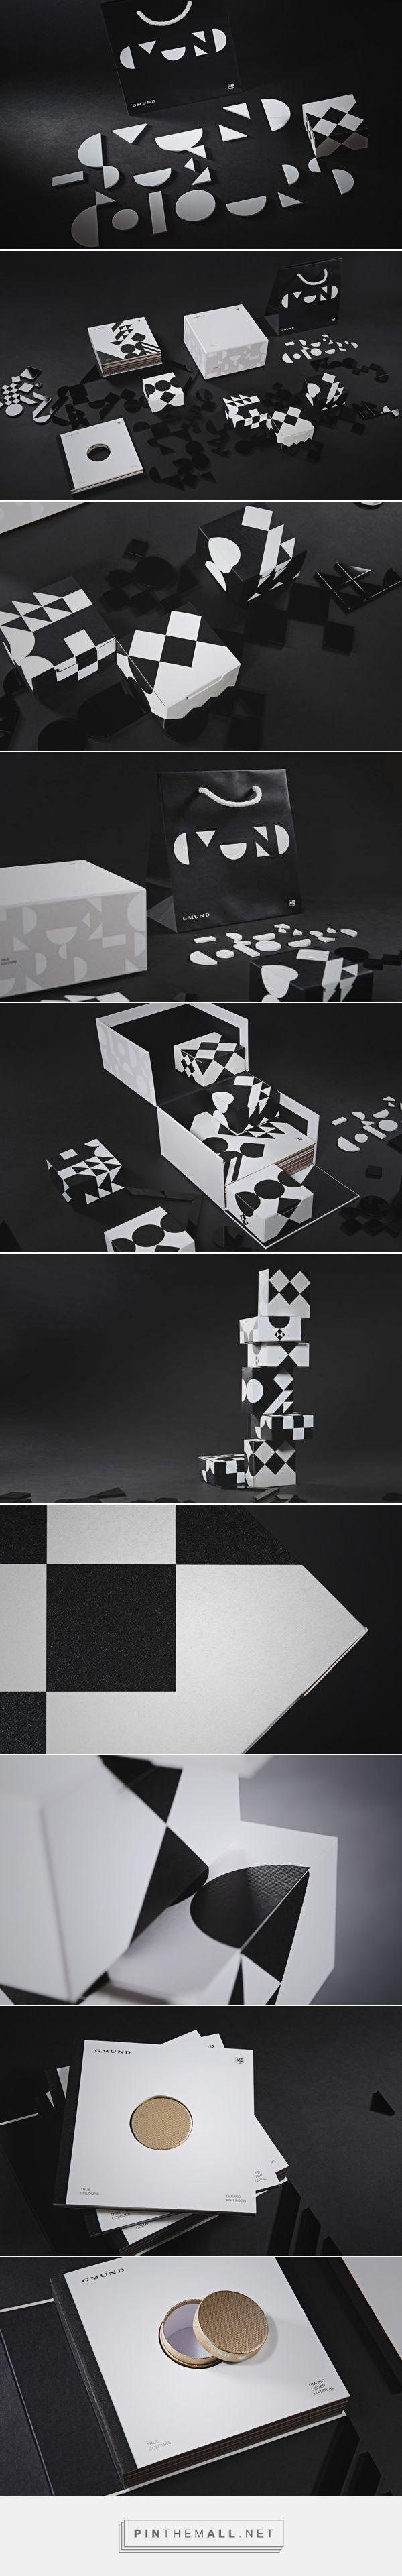 GMUND // paper packaging